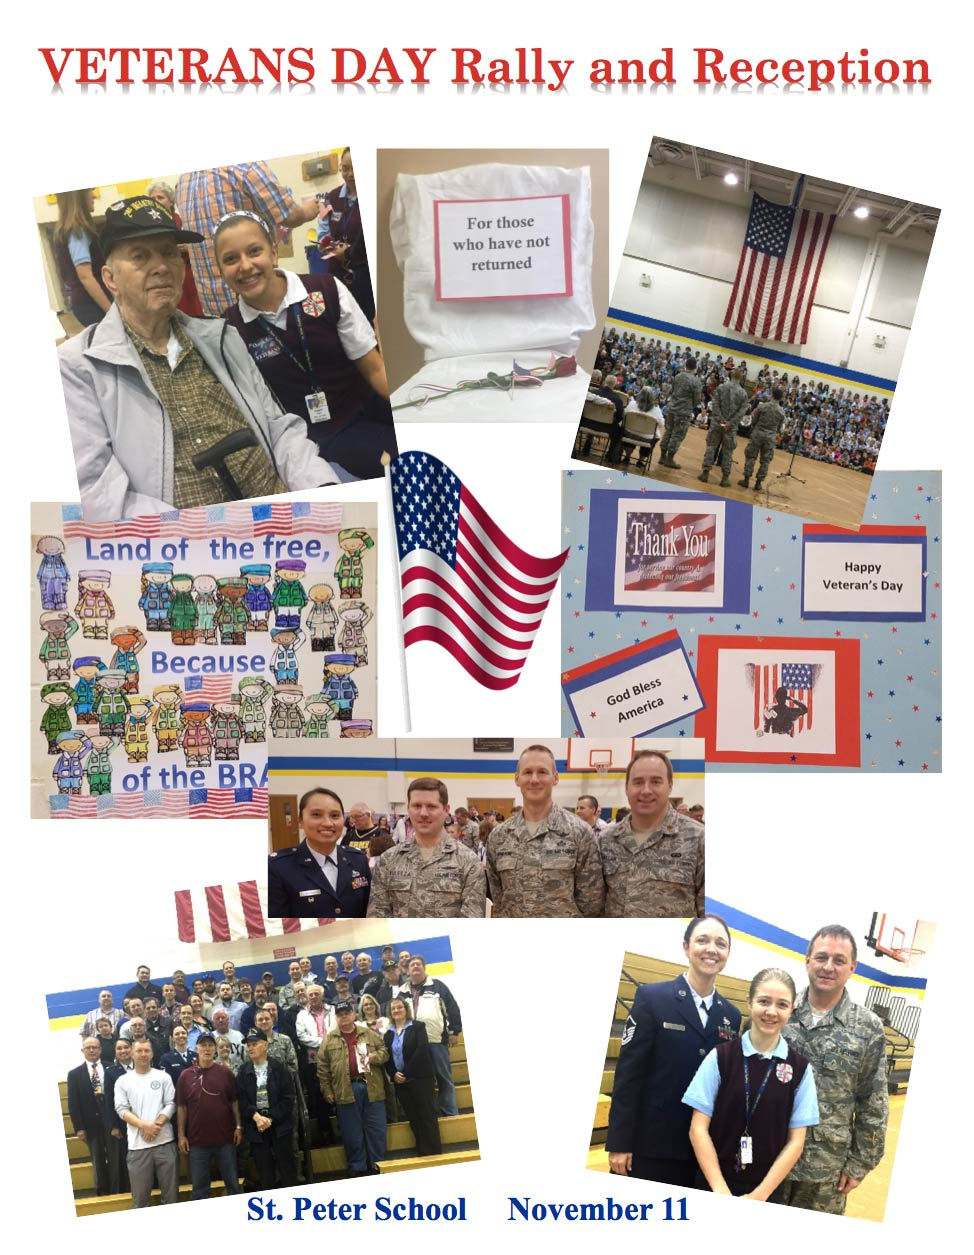 veterans-day-rally